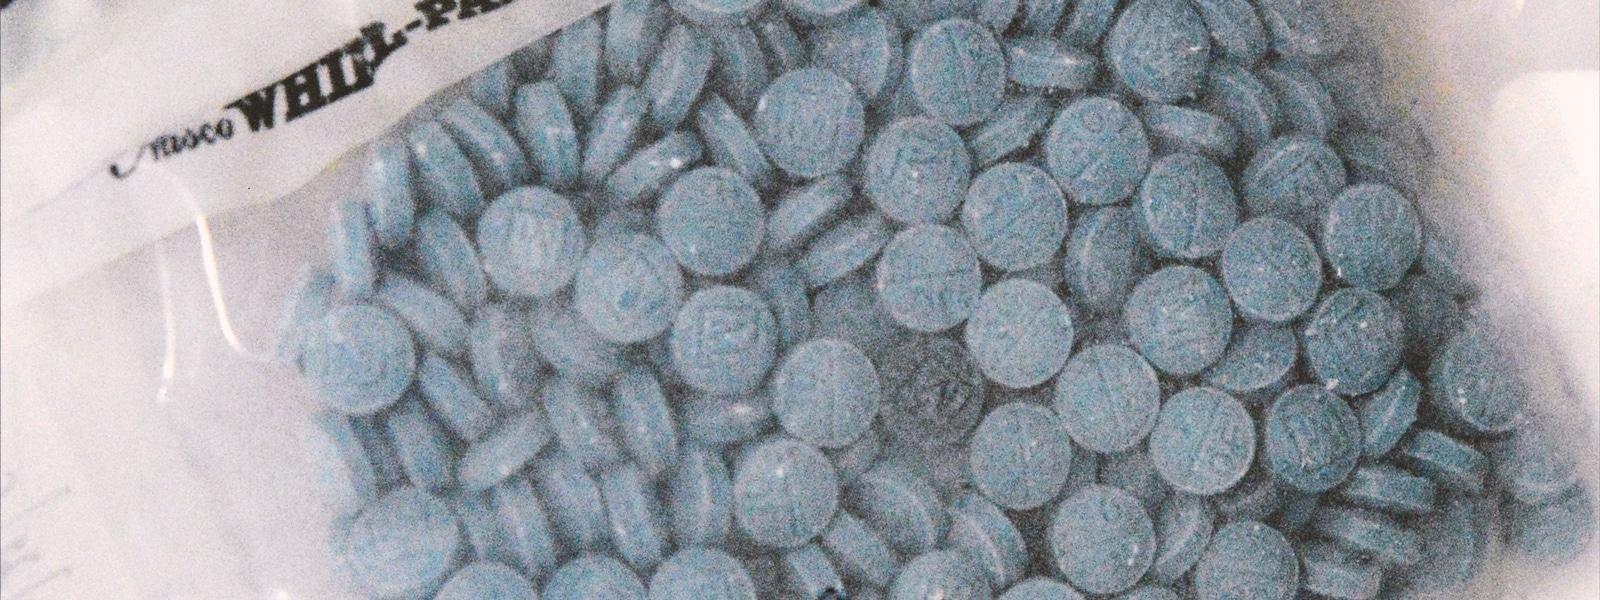 Fentanyl pills bag